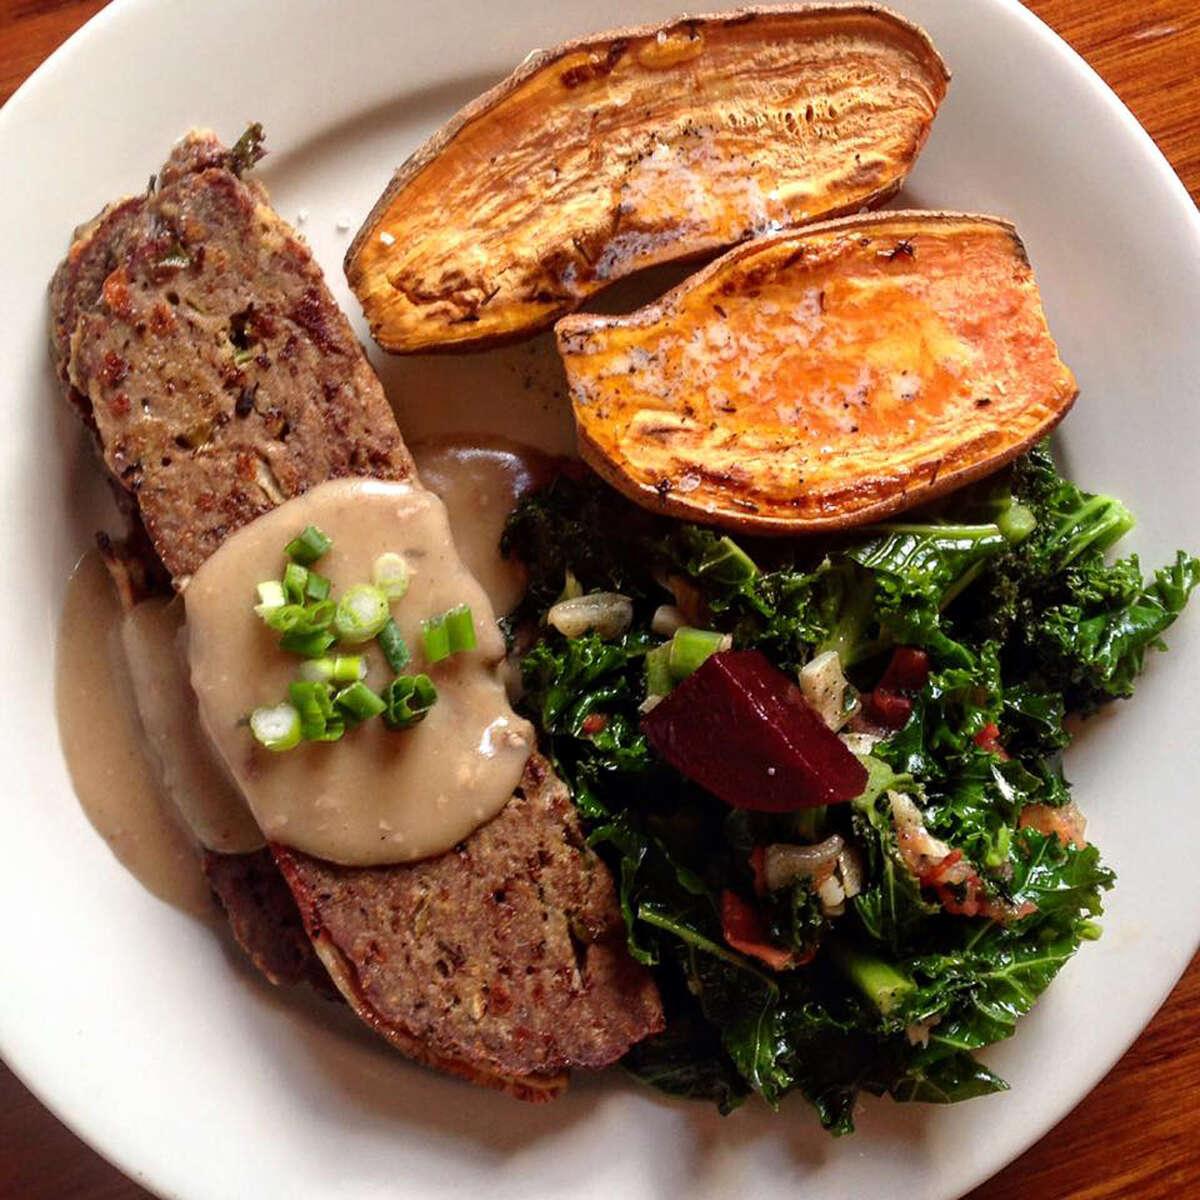 Meatlof at ADK Cafe in Keene.